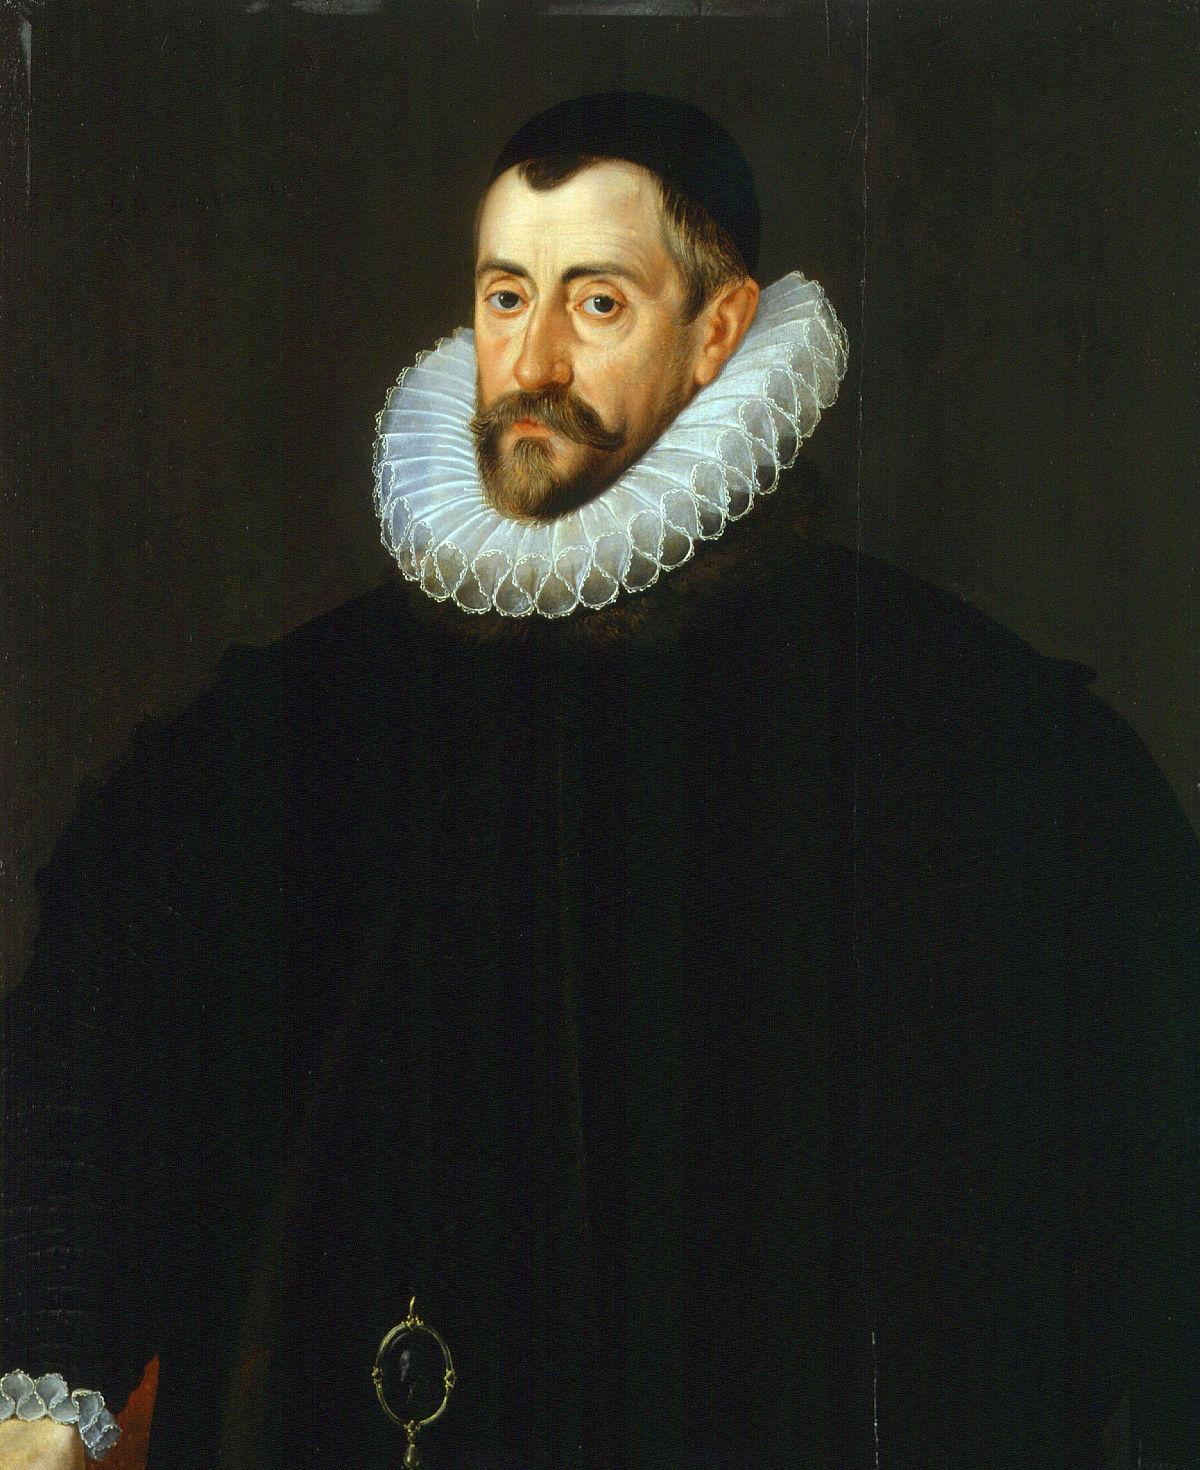 فرانسیس والسینگام